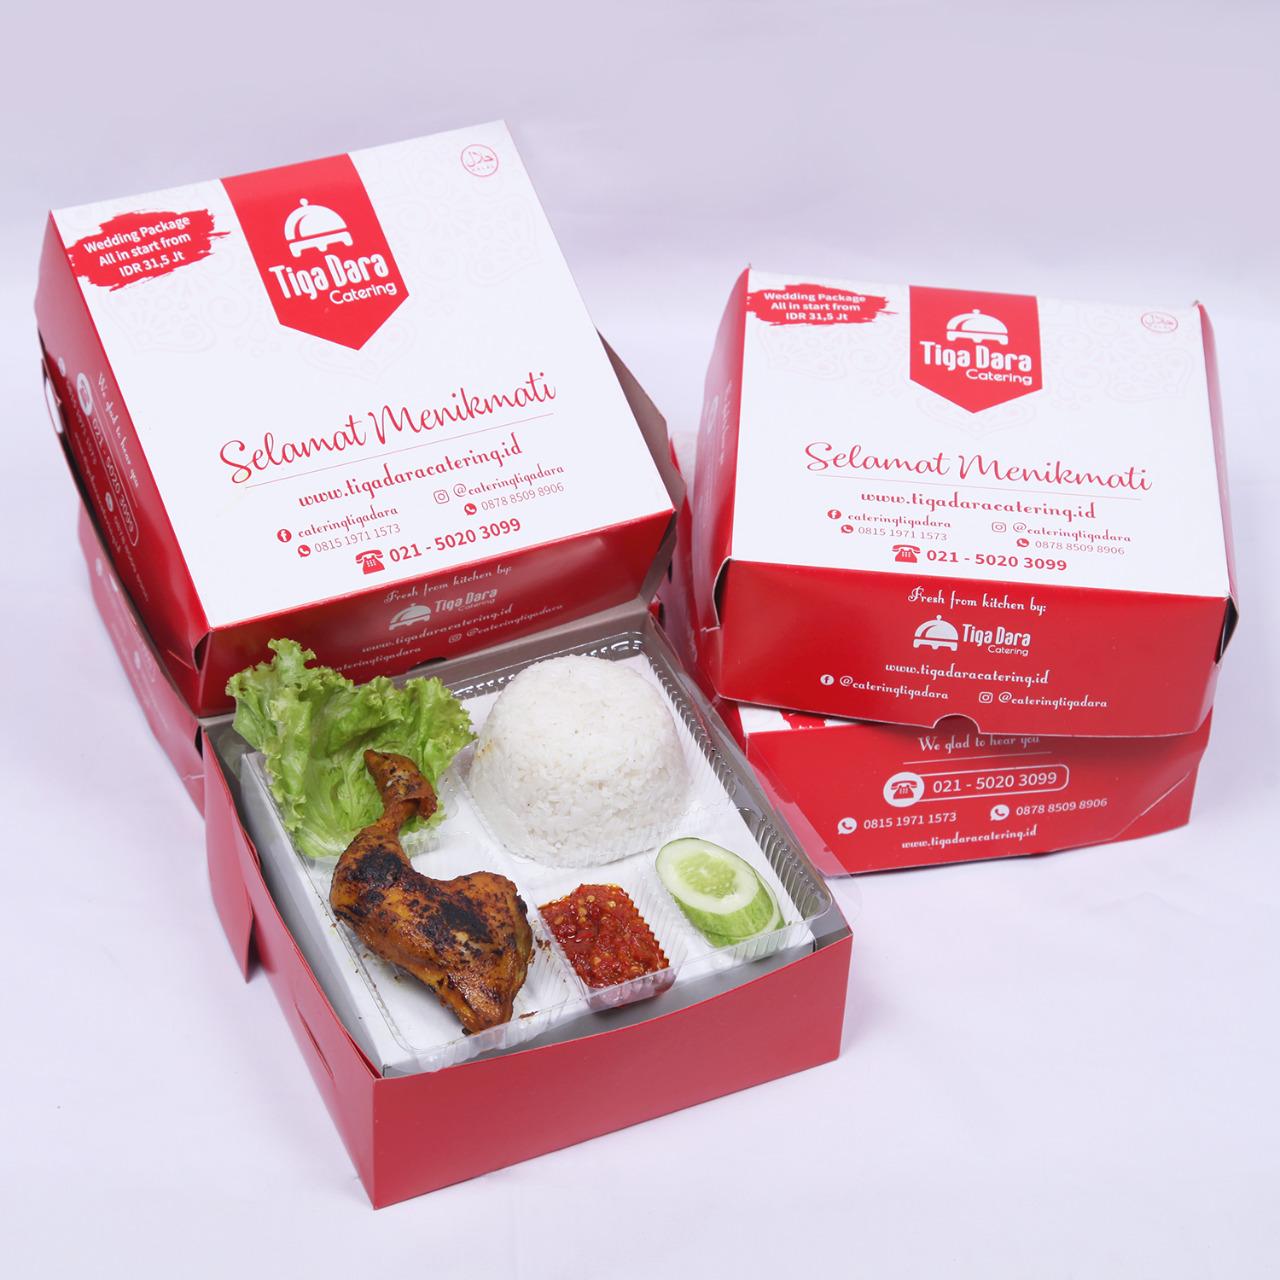 tiga_dara_*Nasi Box Enak & Murah_Economy Class | Paket 1